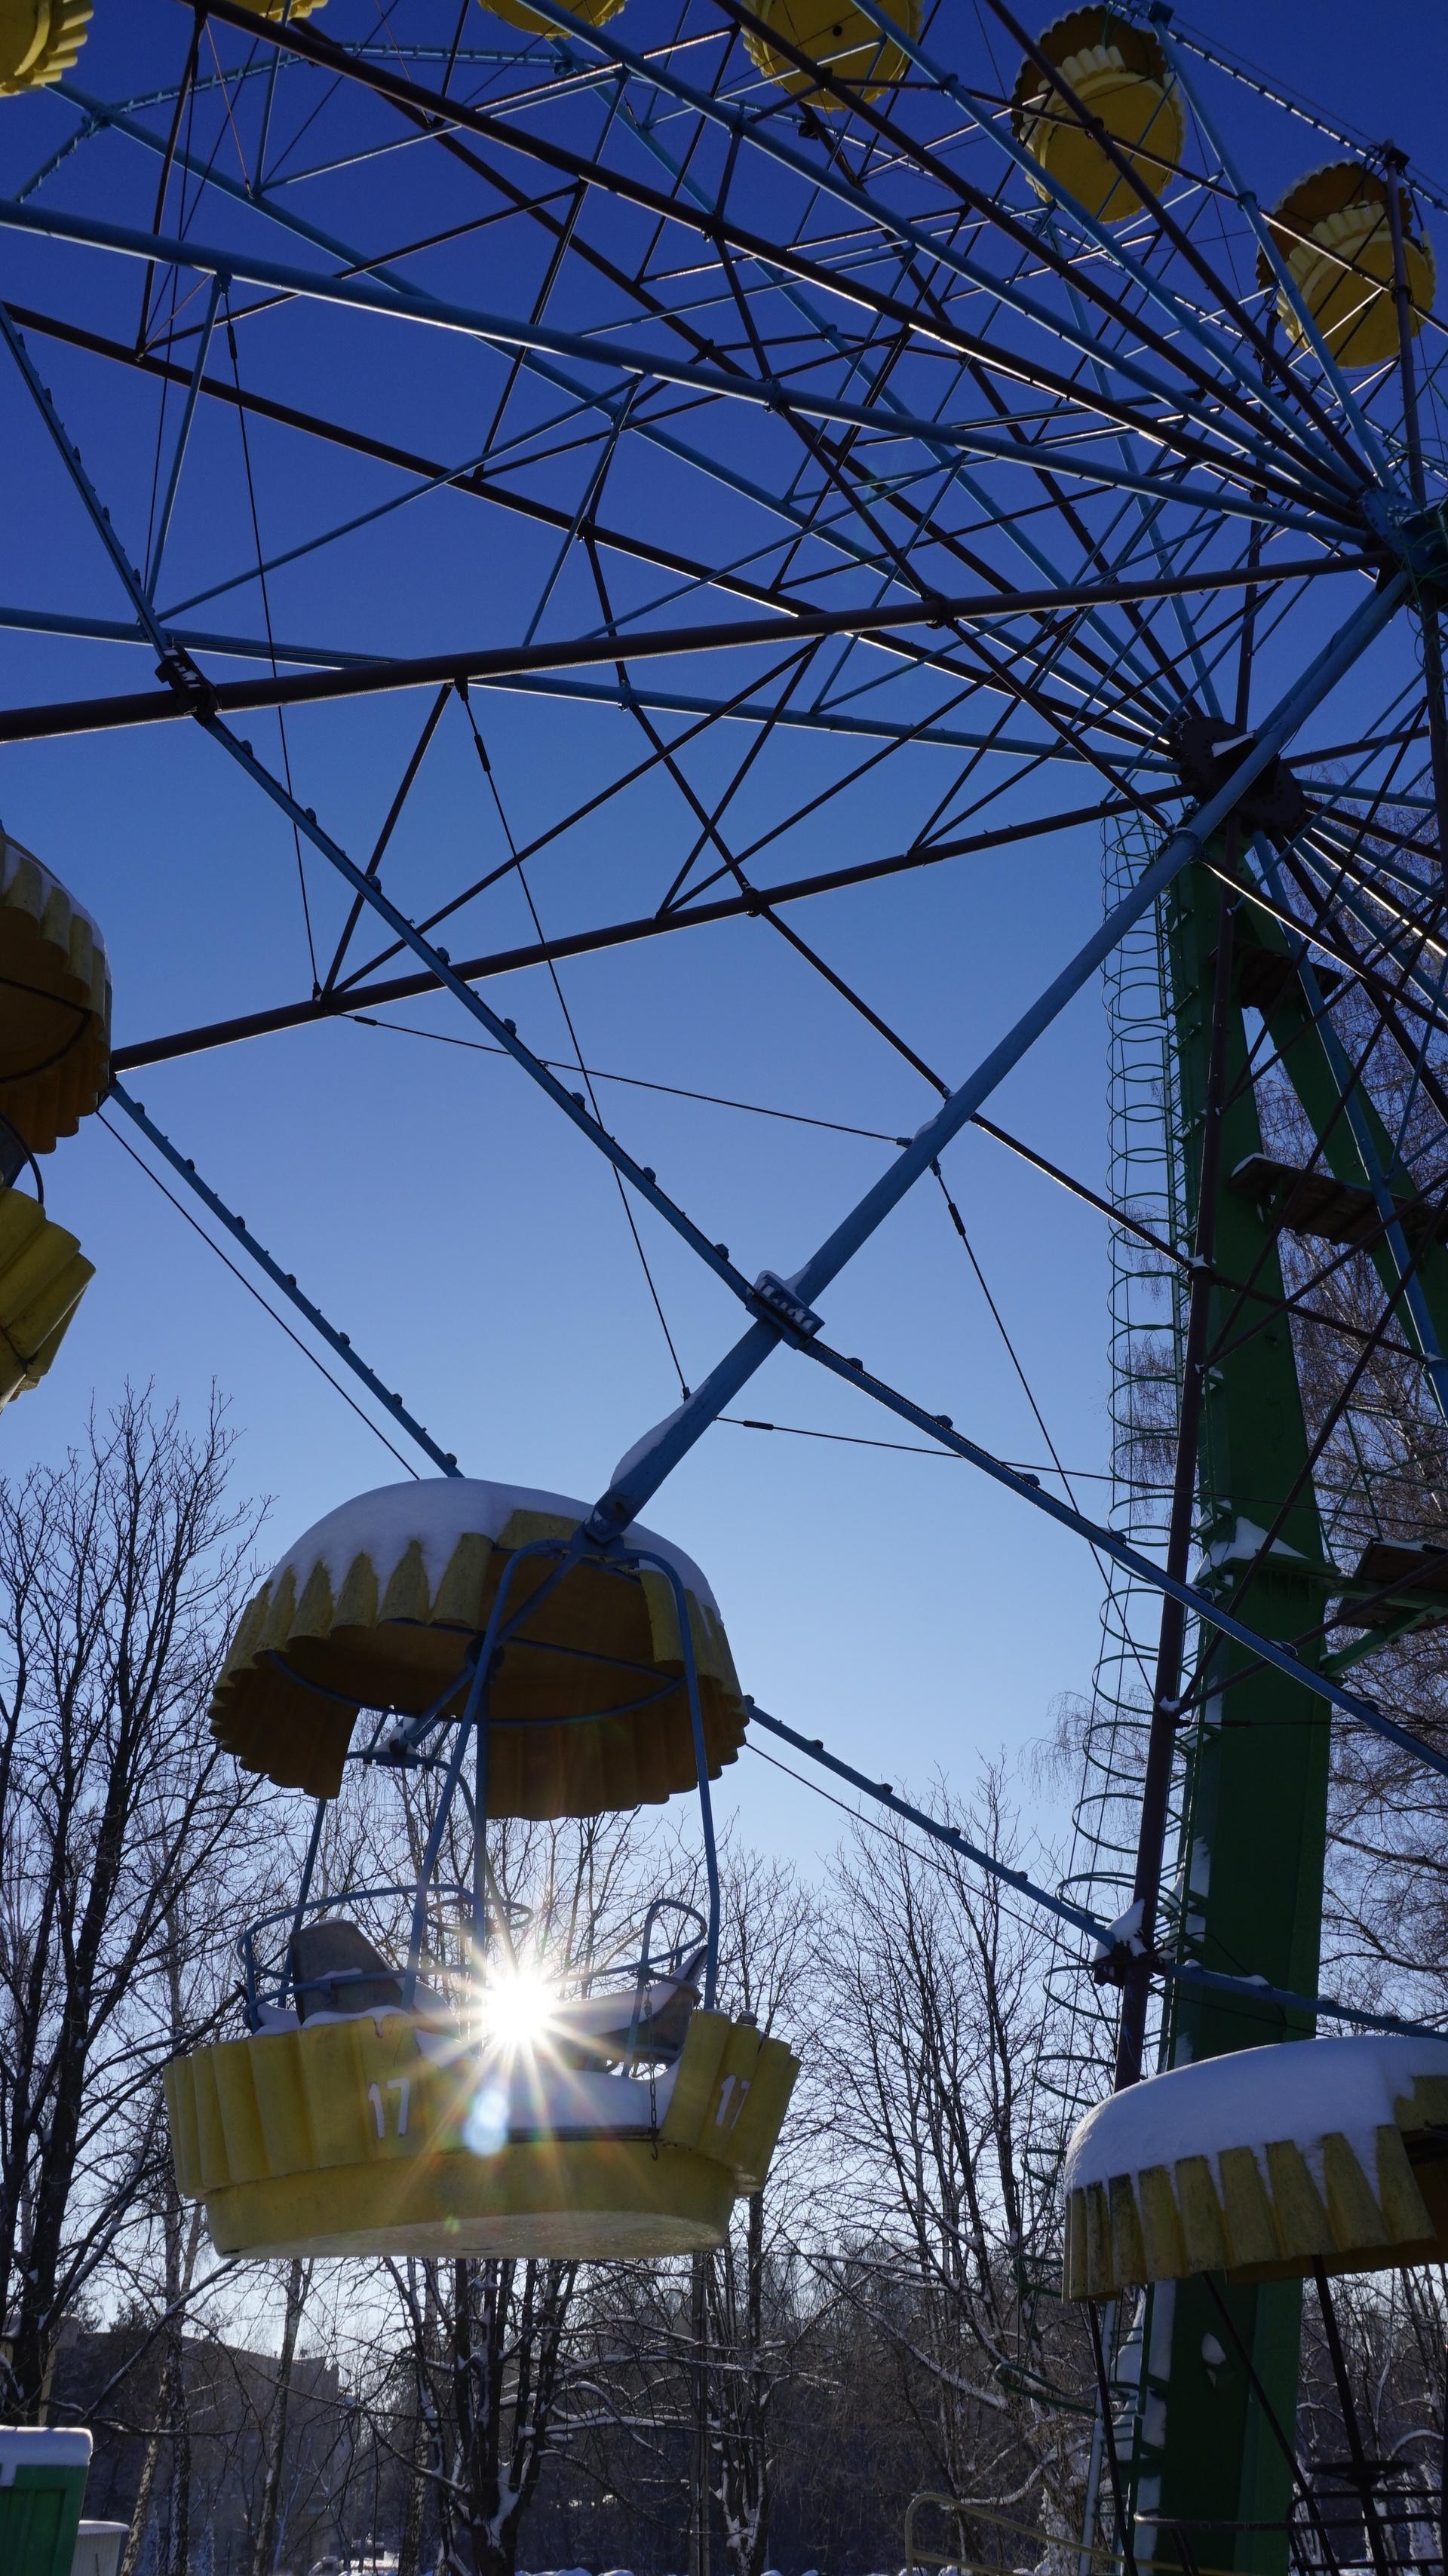 attraction   nastia95, blue sky, bright, business